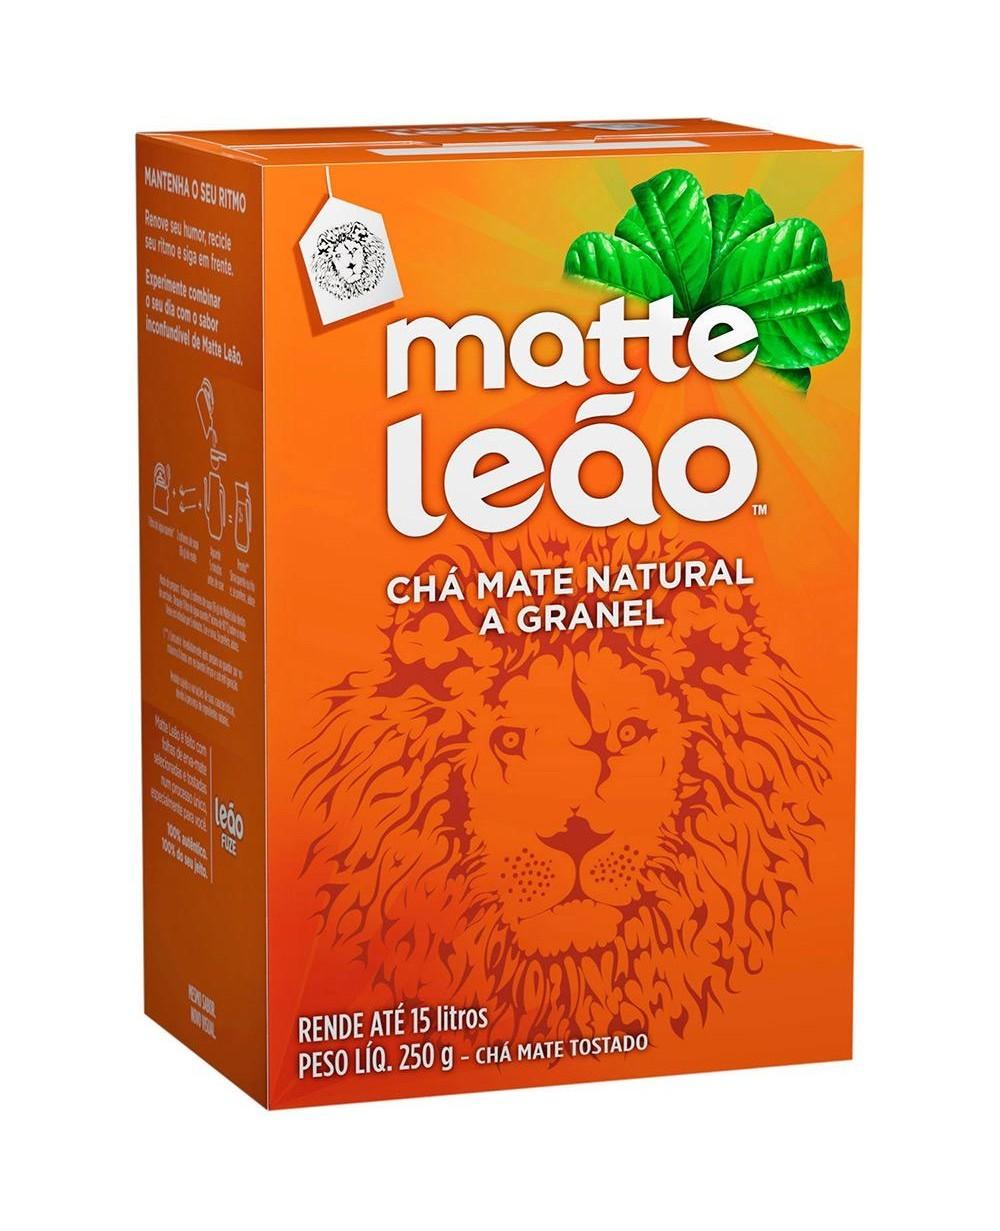 Cha Mate Natural Matte Leao A Granel 250 g